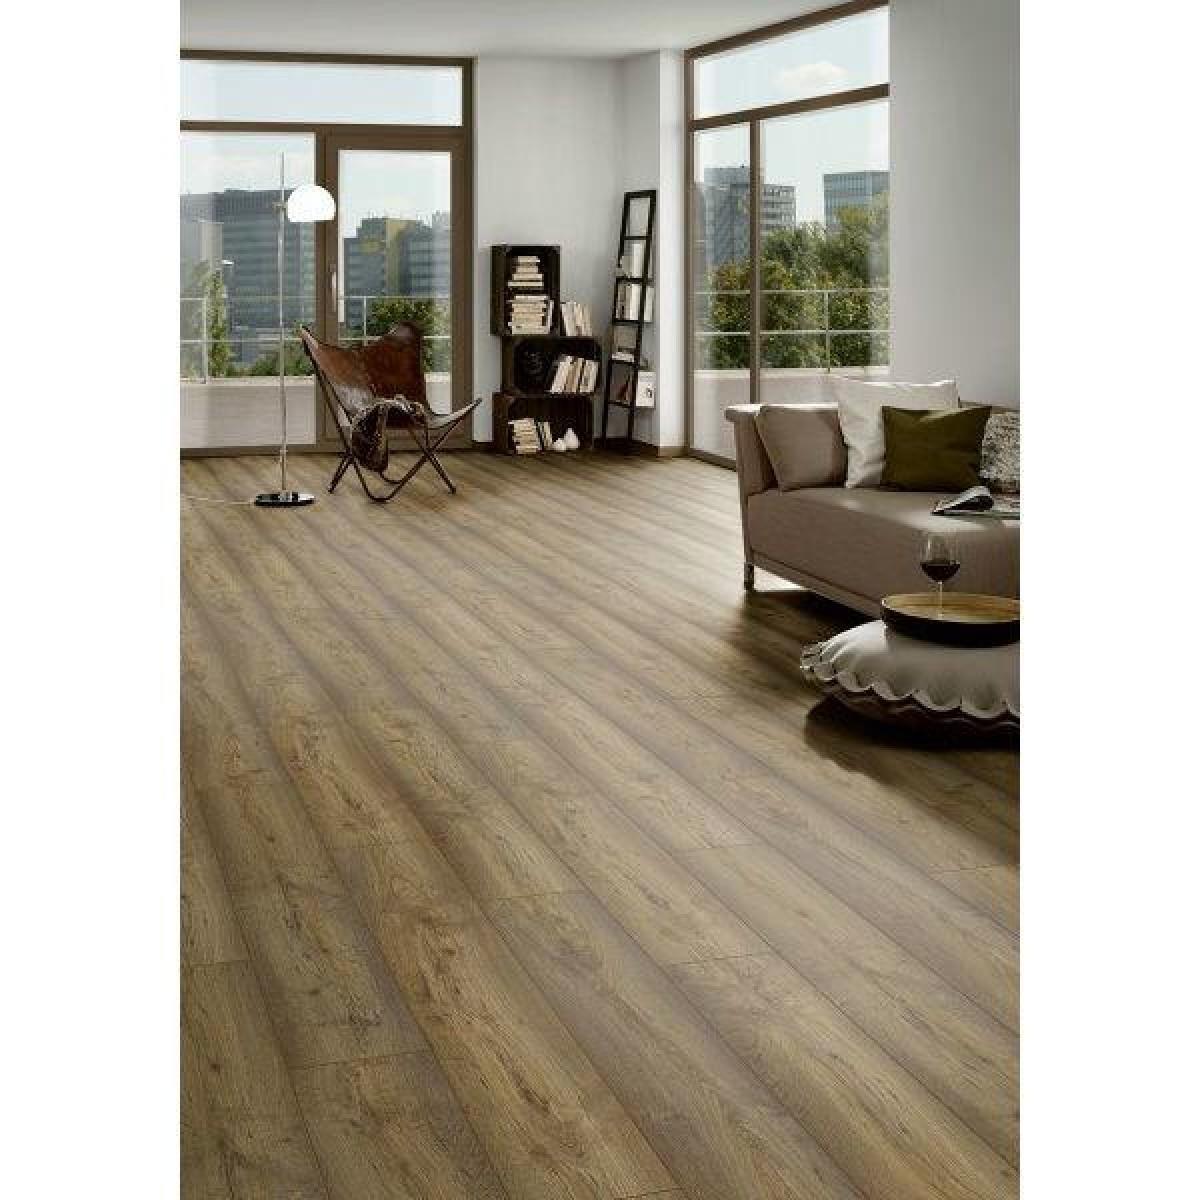 Prestige Habana Oak Laminate Flooring Xxmm SYper Pack - Cheap laminate flooring packs